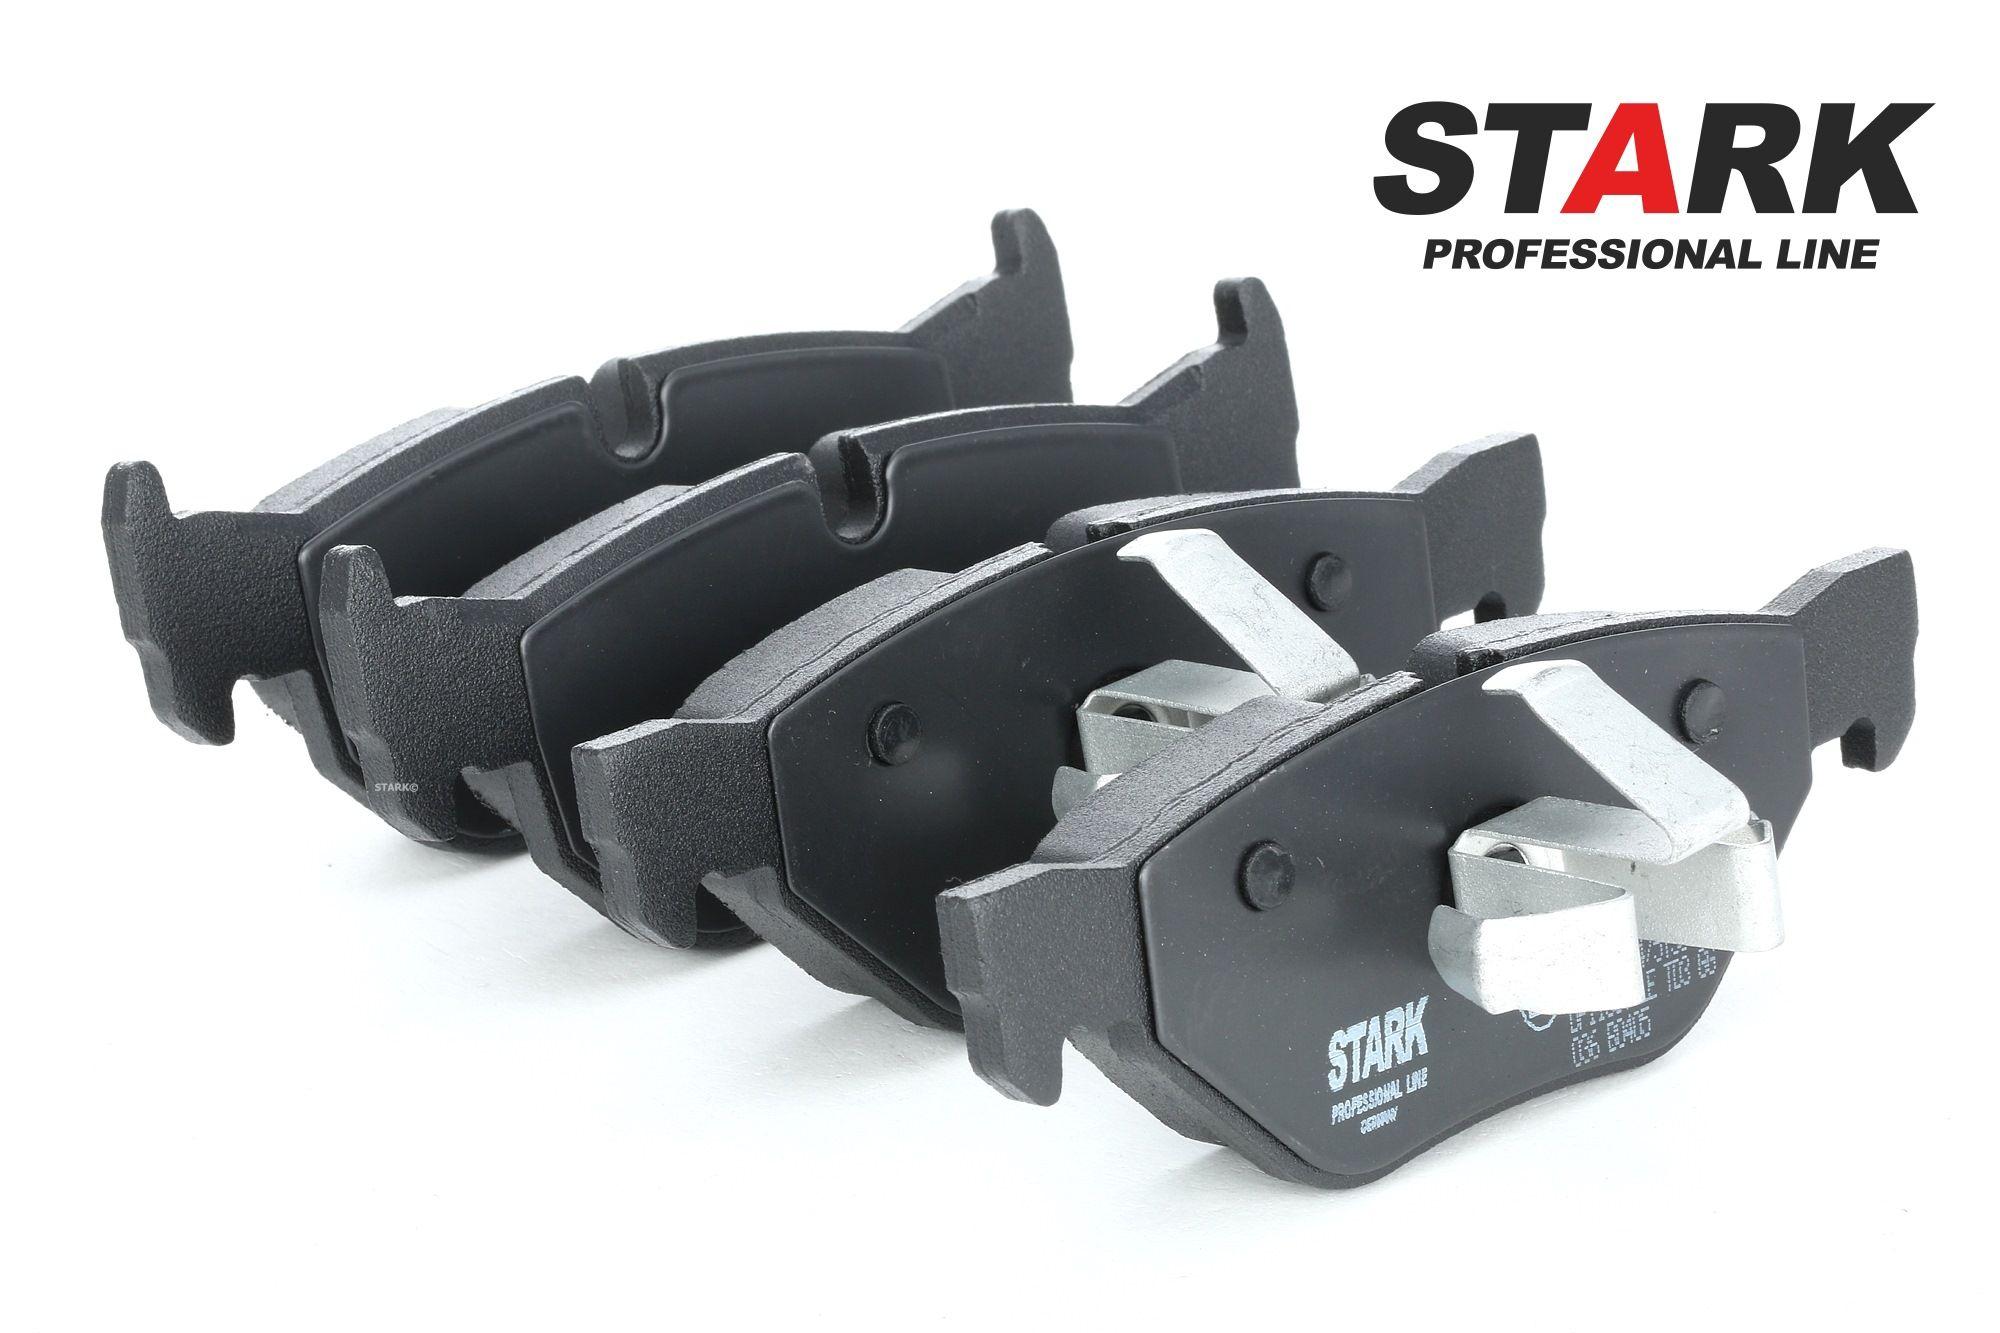 STARK %ART_NO_SYN_CLEAR% %DYNAMIC_AUTOPART_SYNONYM% BMW X1 E84 xDrive28i Flex 2.0 2012 245 PS - Premium Autoteile-Angebot